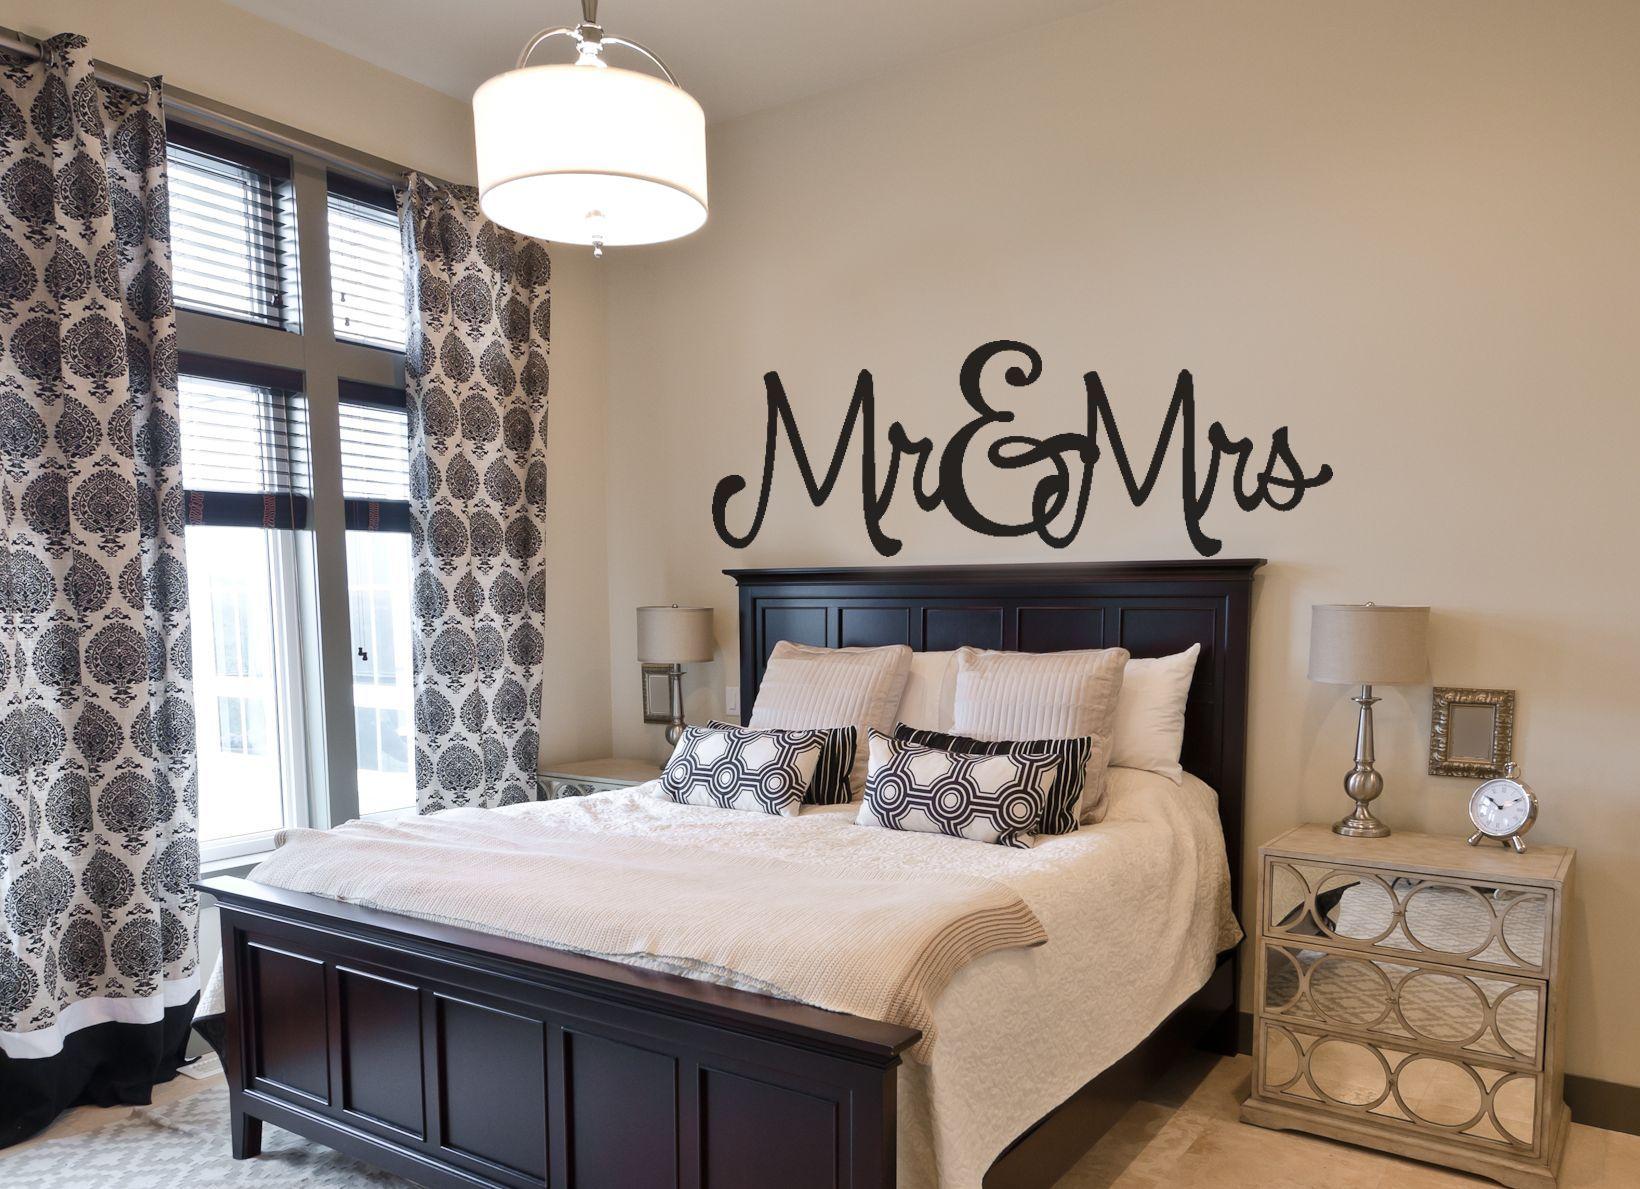 Bedroom wall decal mr u mrs amandaus designer decals pinterest